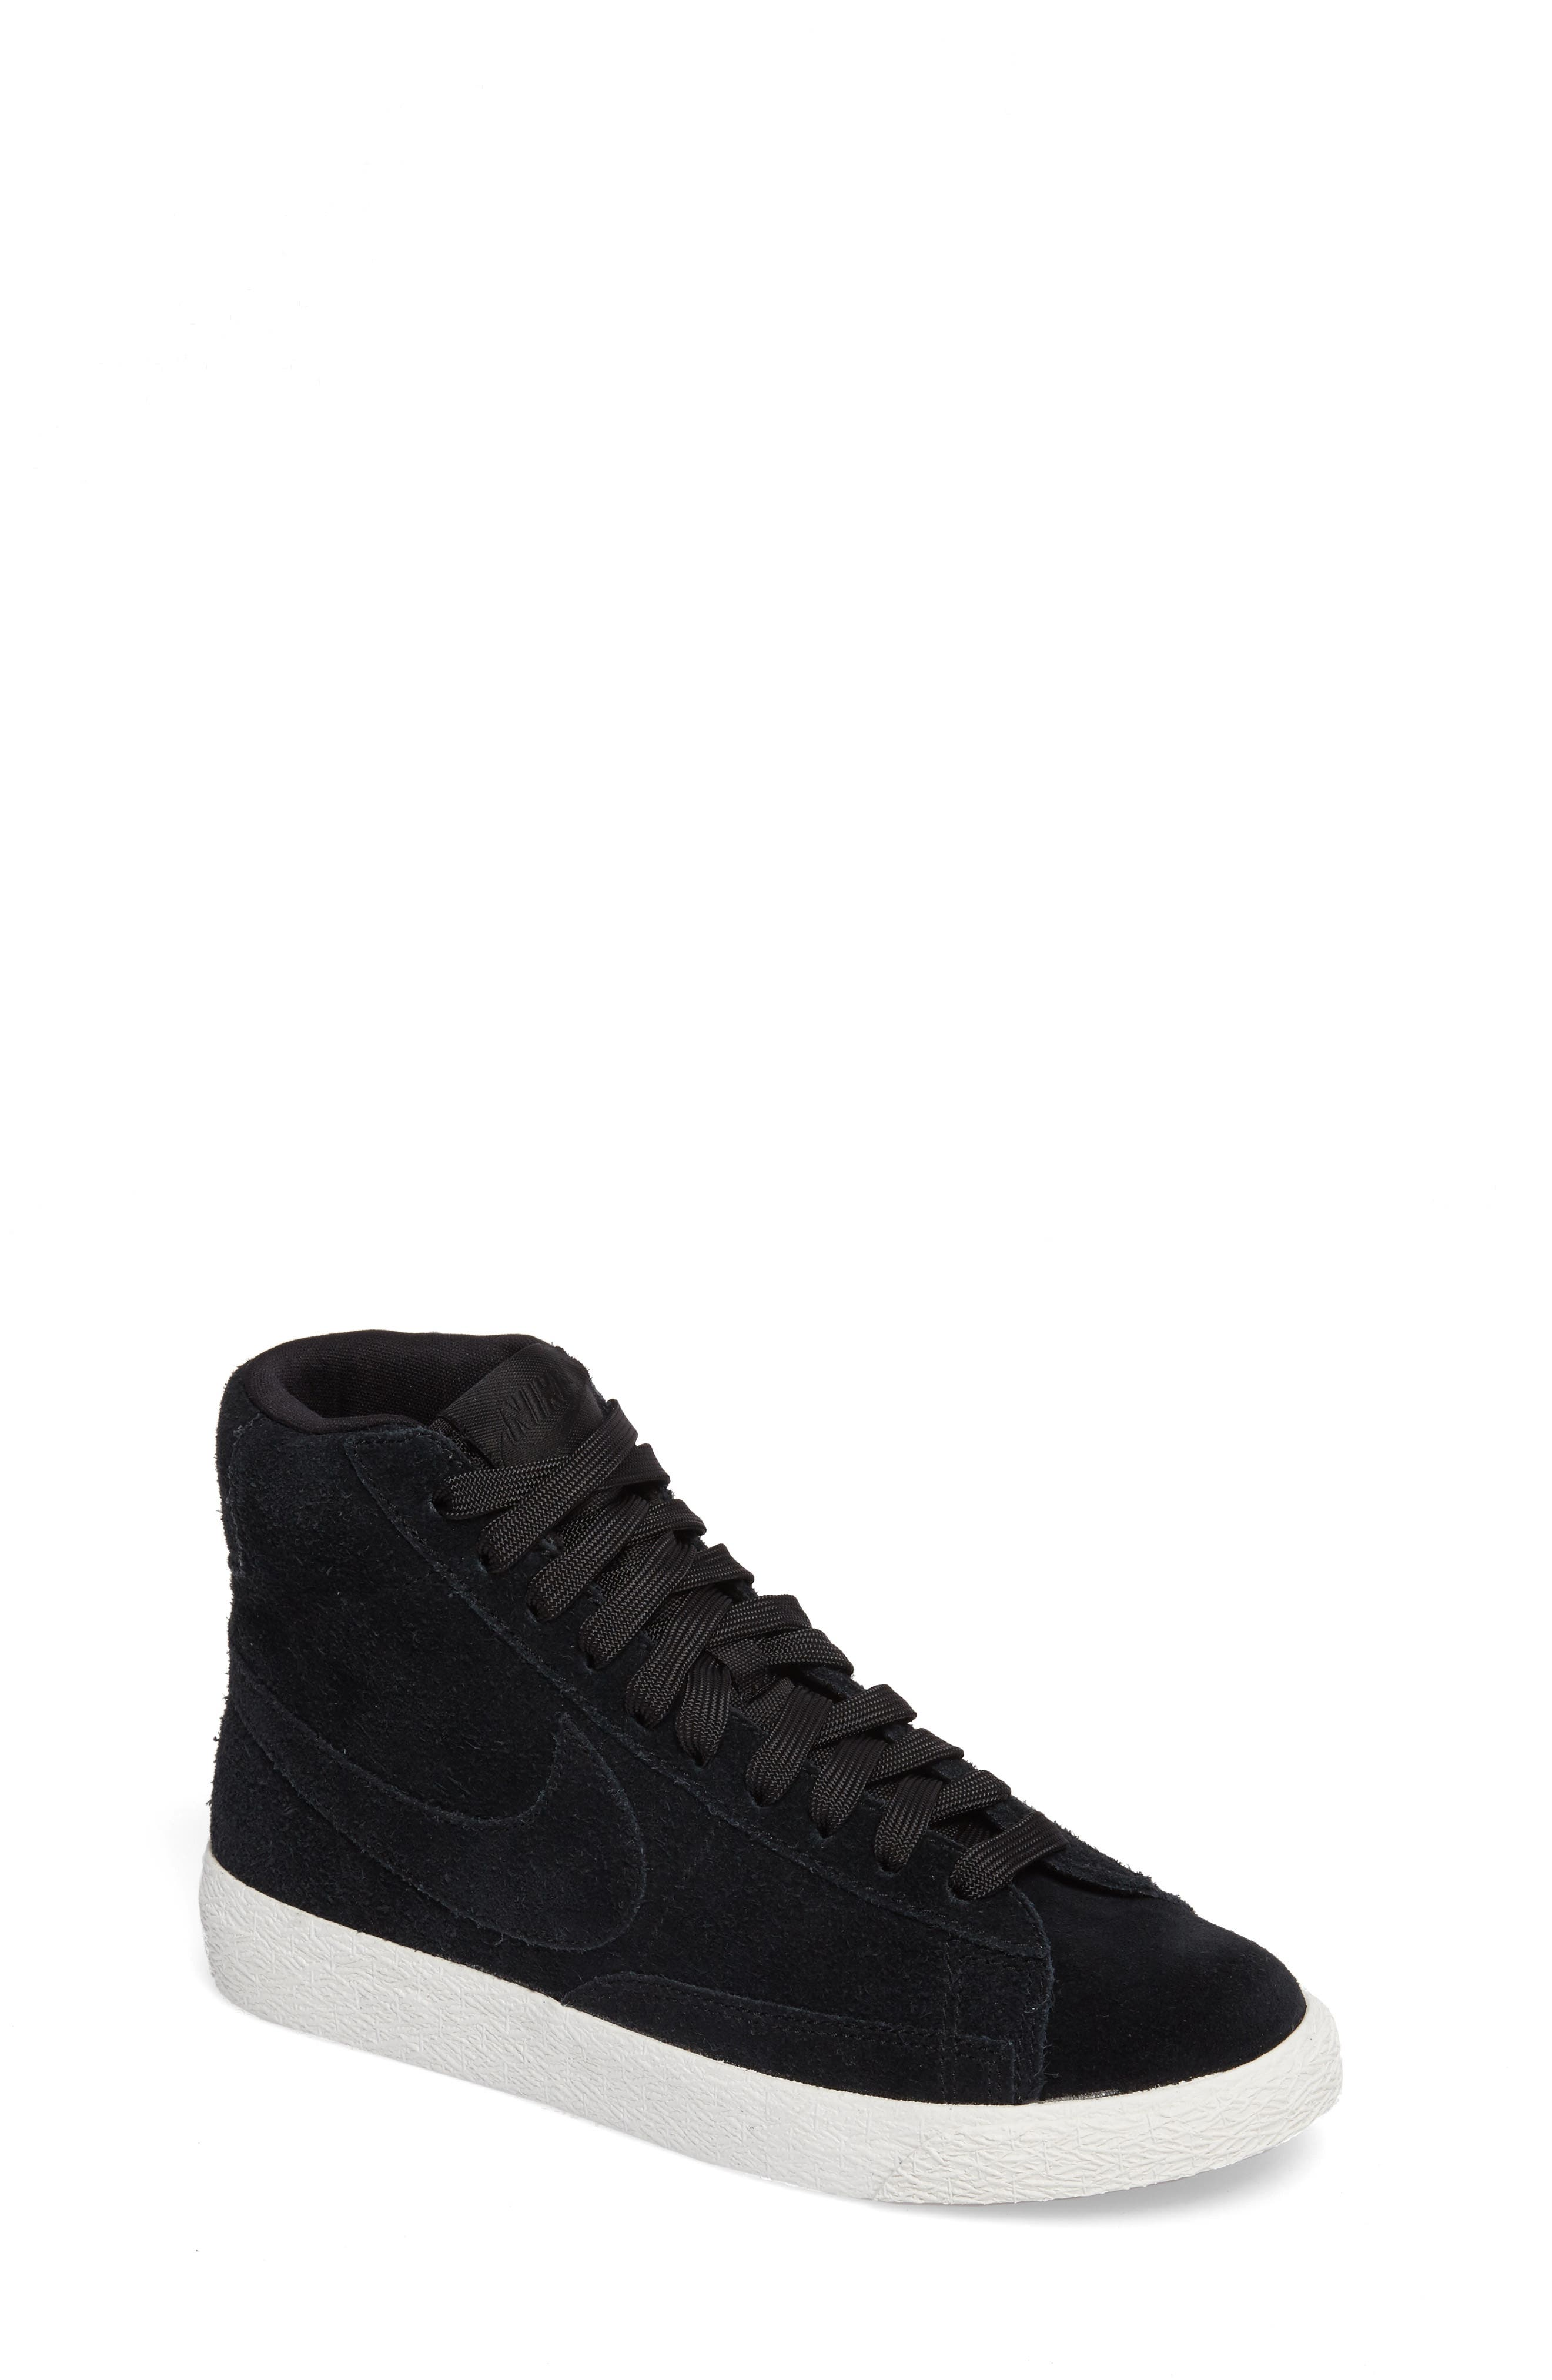 Nike Blazer Mid High Top Sneaker (Big Kid)